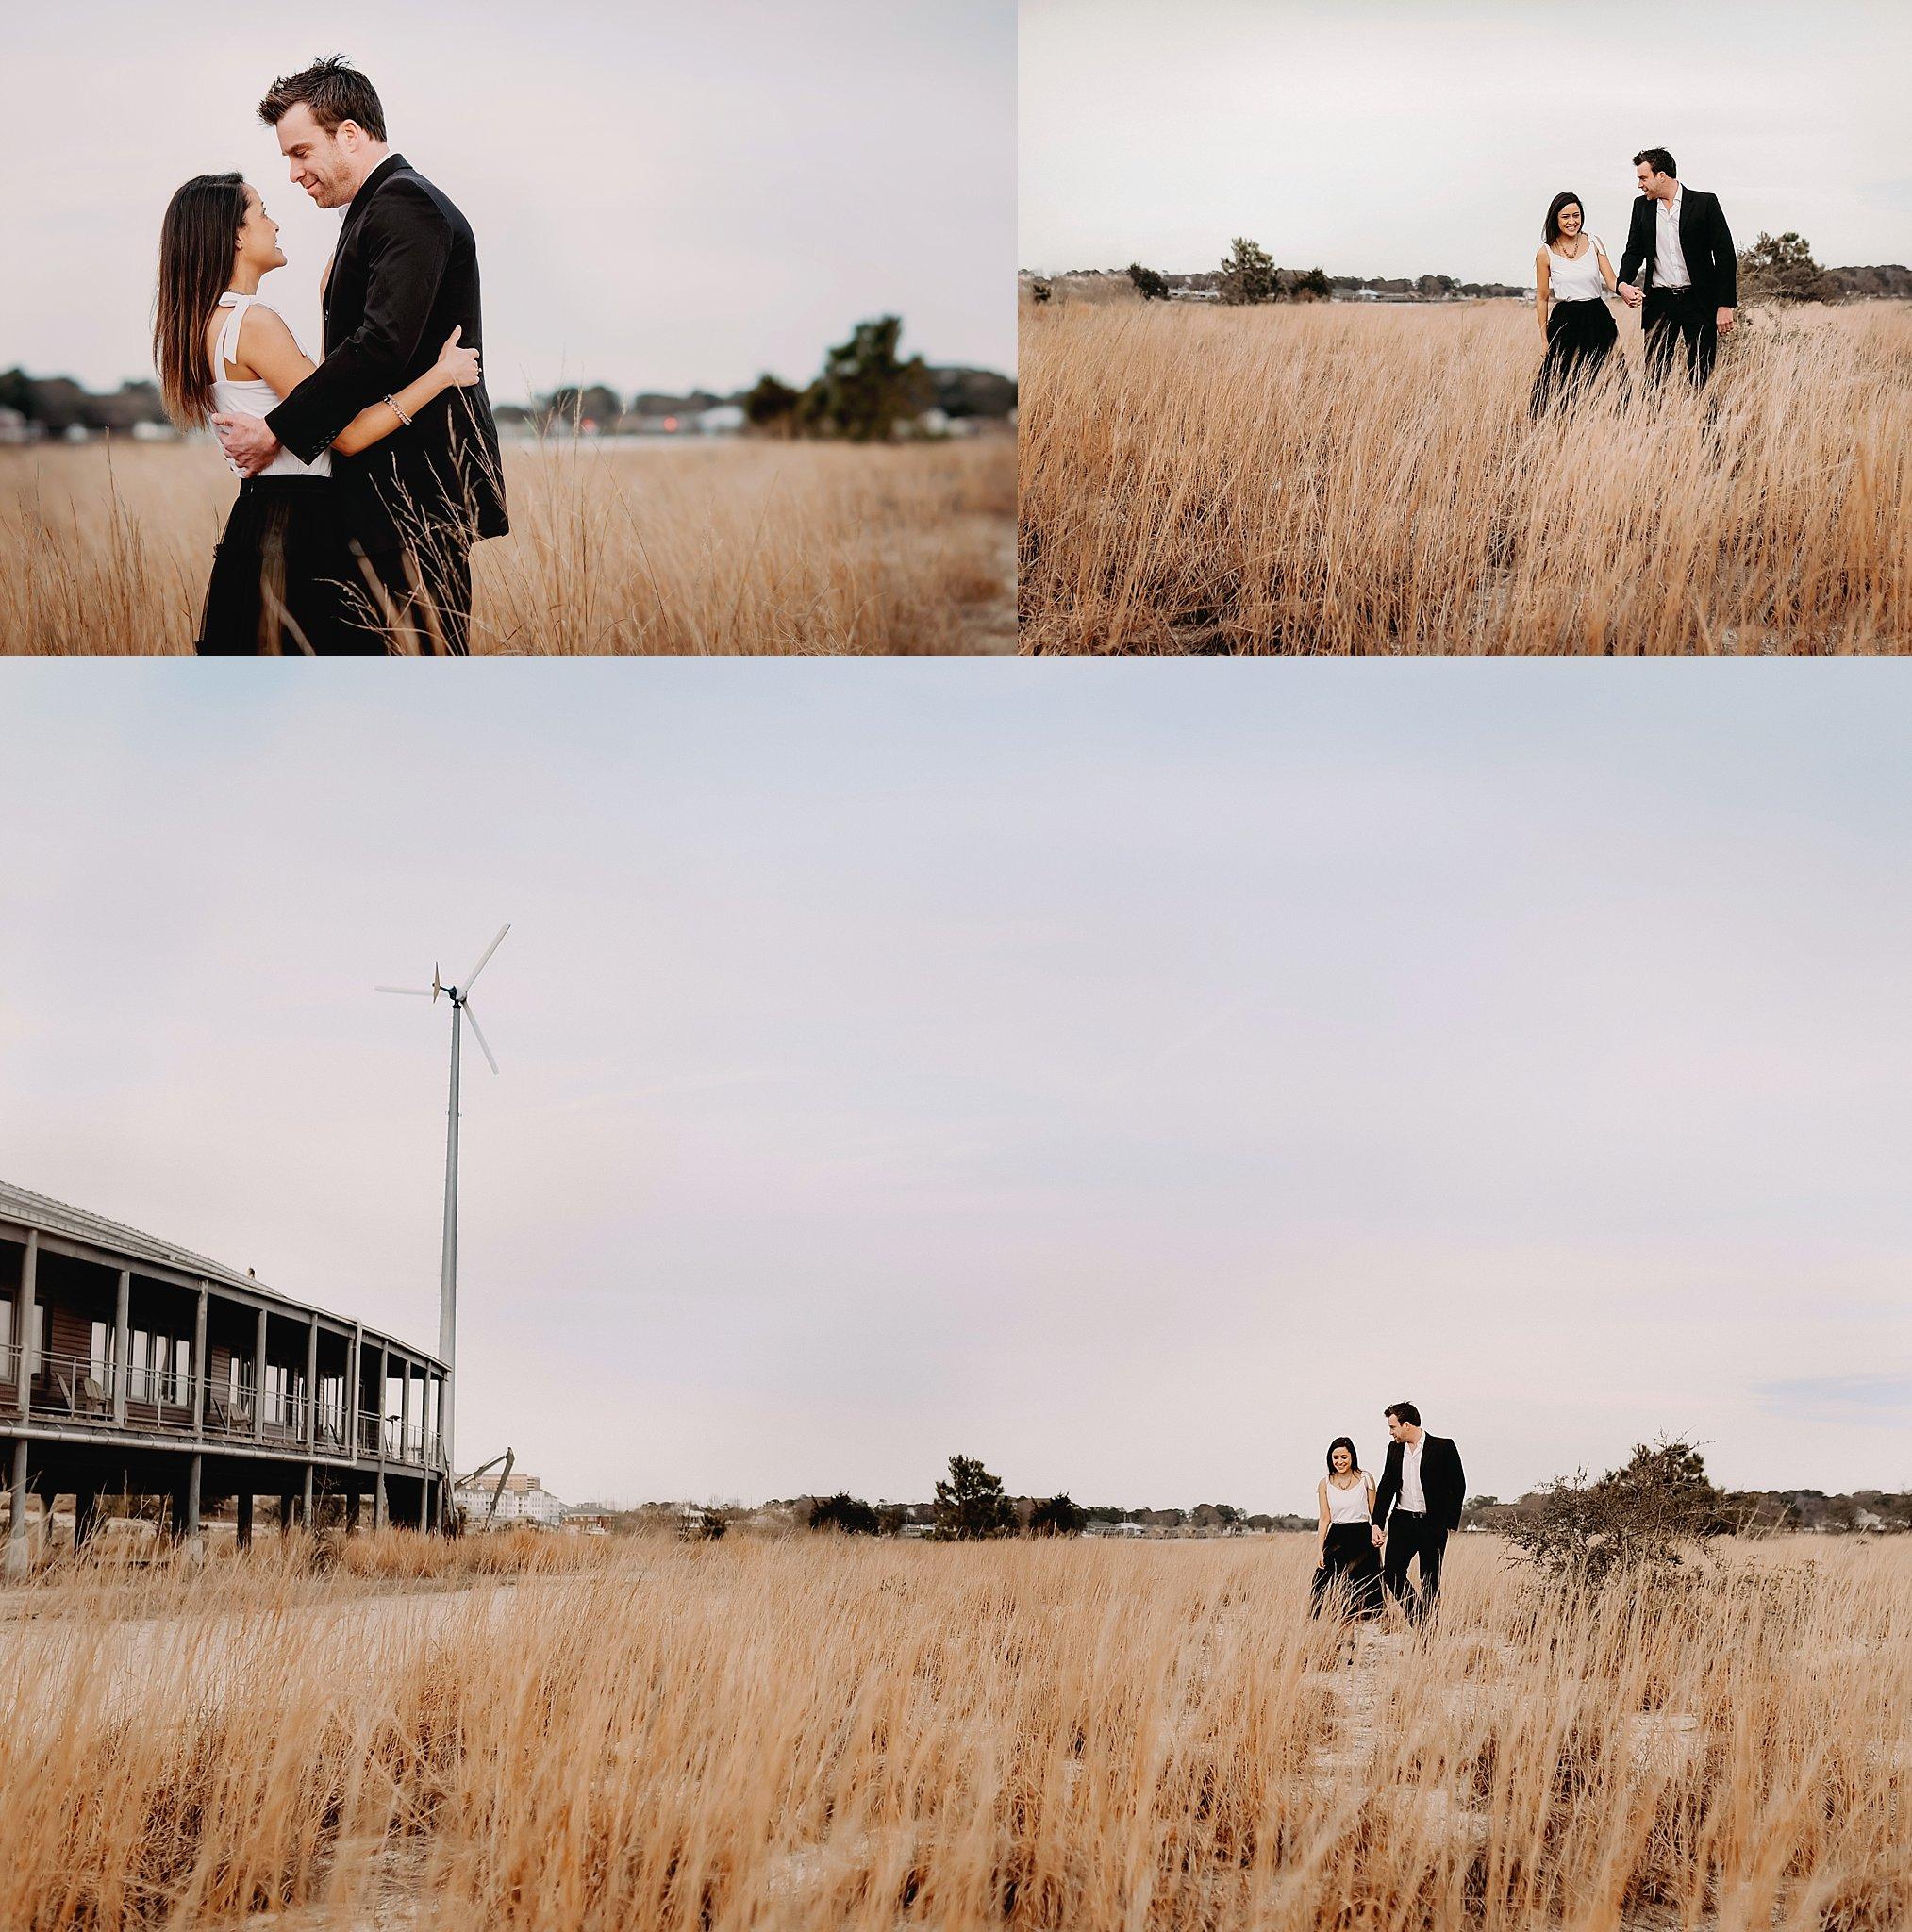 couple-walks-at-sunset-pleasure-house-point-engagement-photos-melissa-bliss-photography.jpg